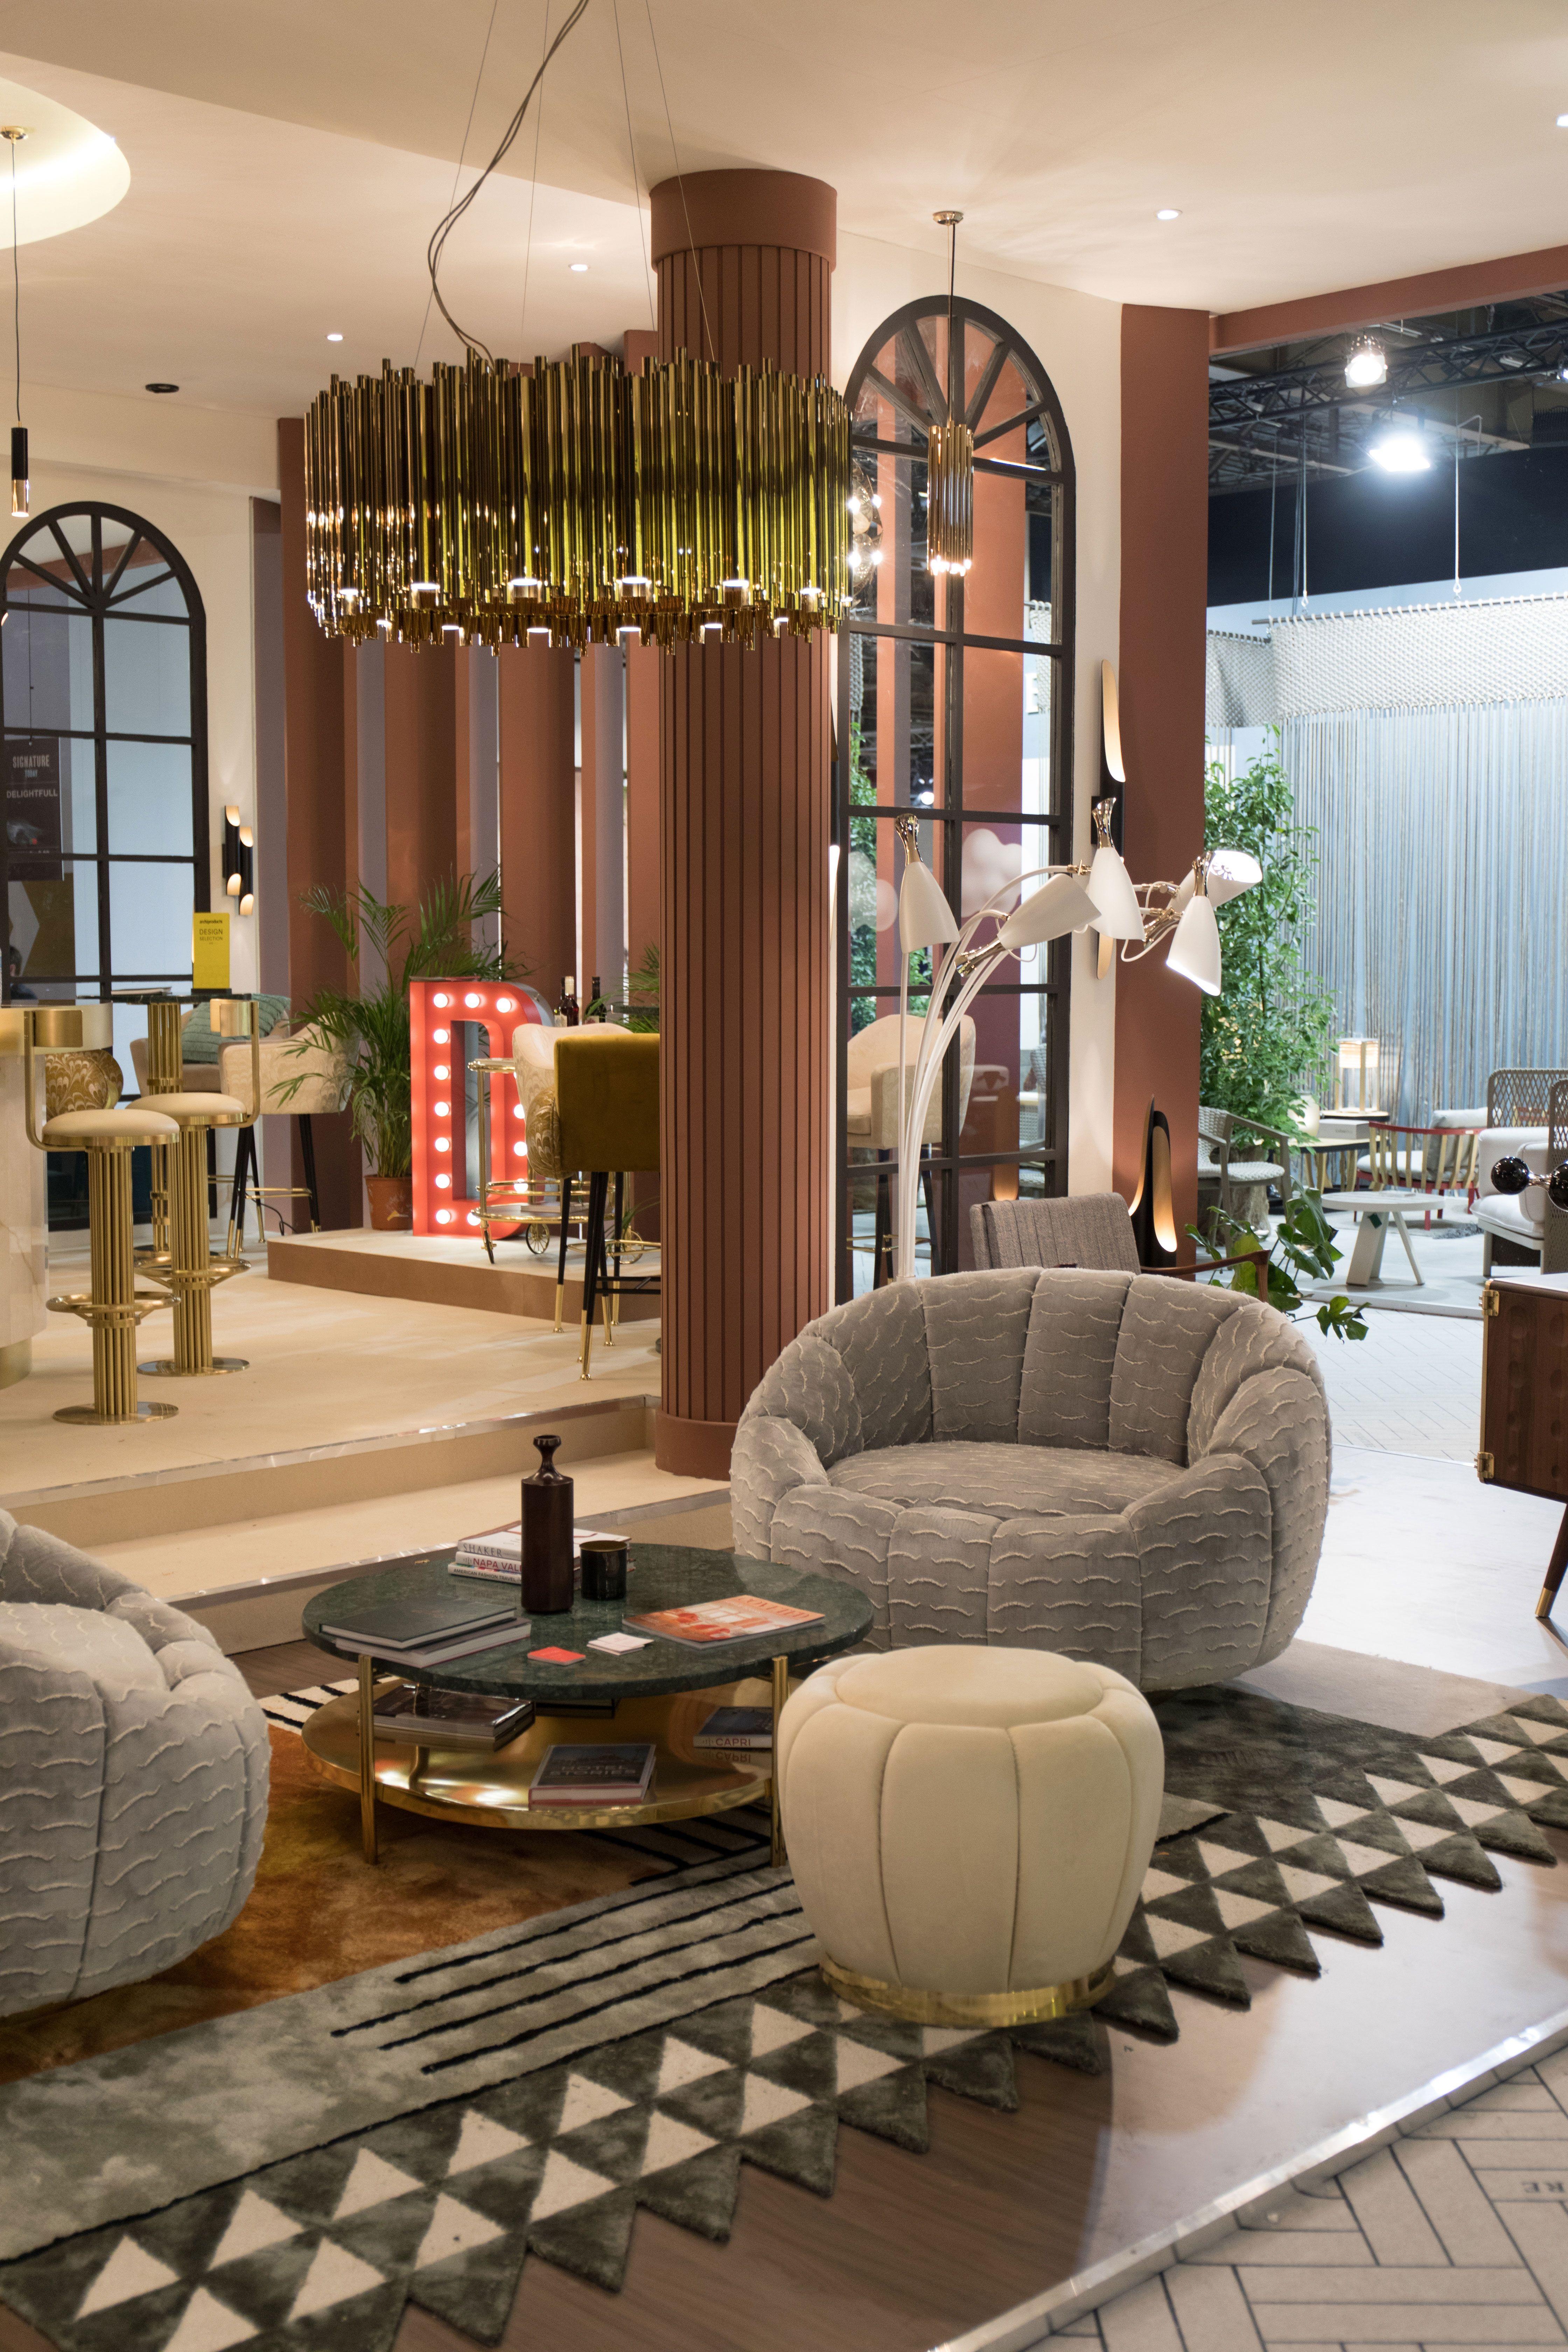 Interior Design Trends Presented At Maison Objet 2019 Interior Design Dining Room Design Interior Design Trends